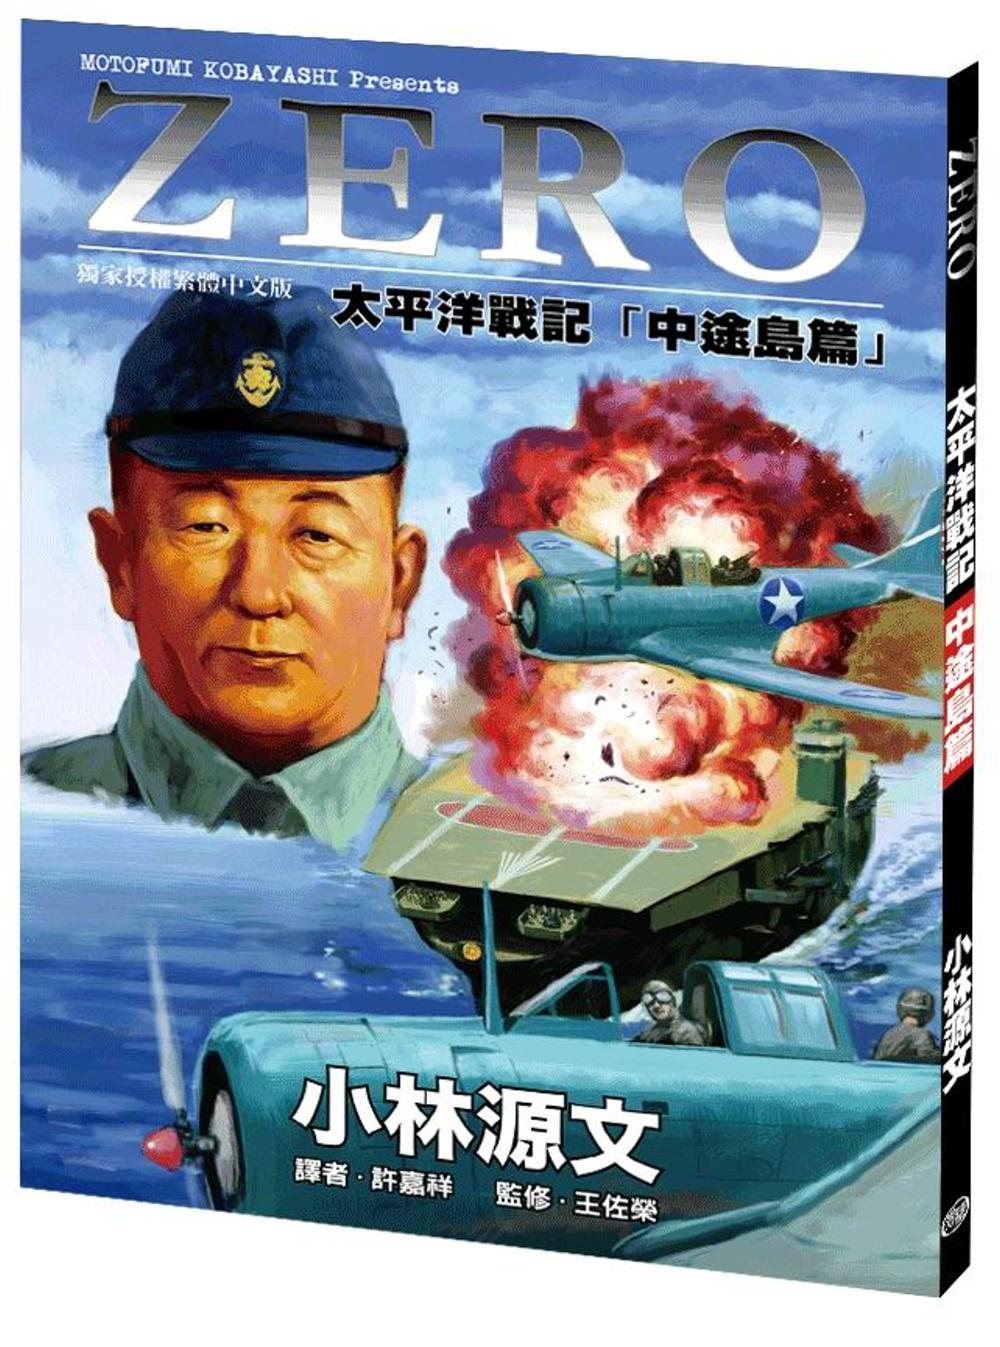 ZERO太平洋戰記「中途島篇」[A4大開本]